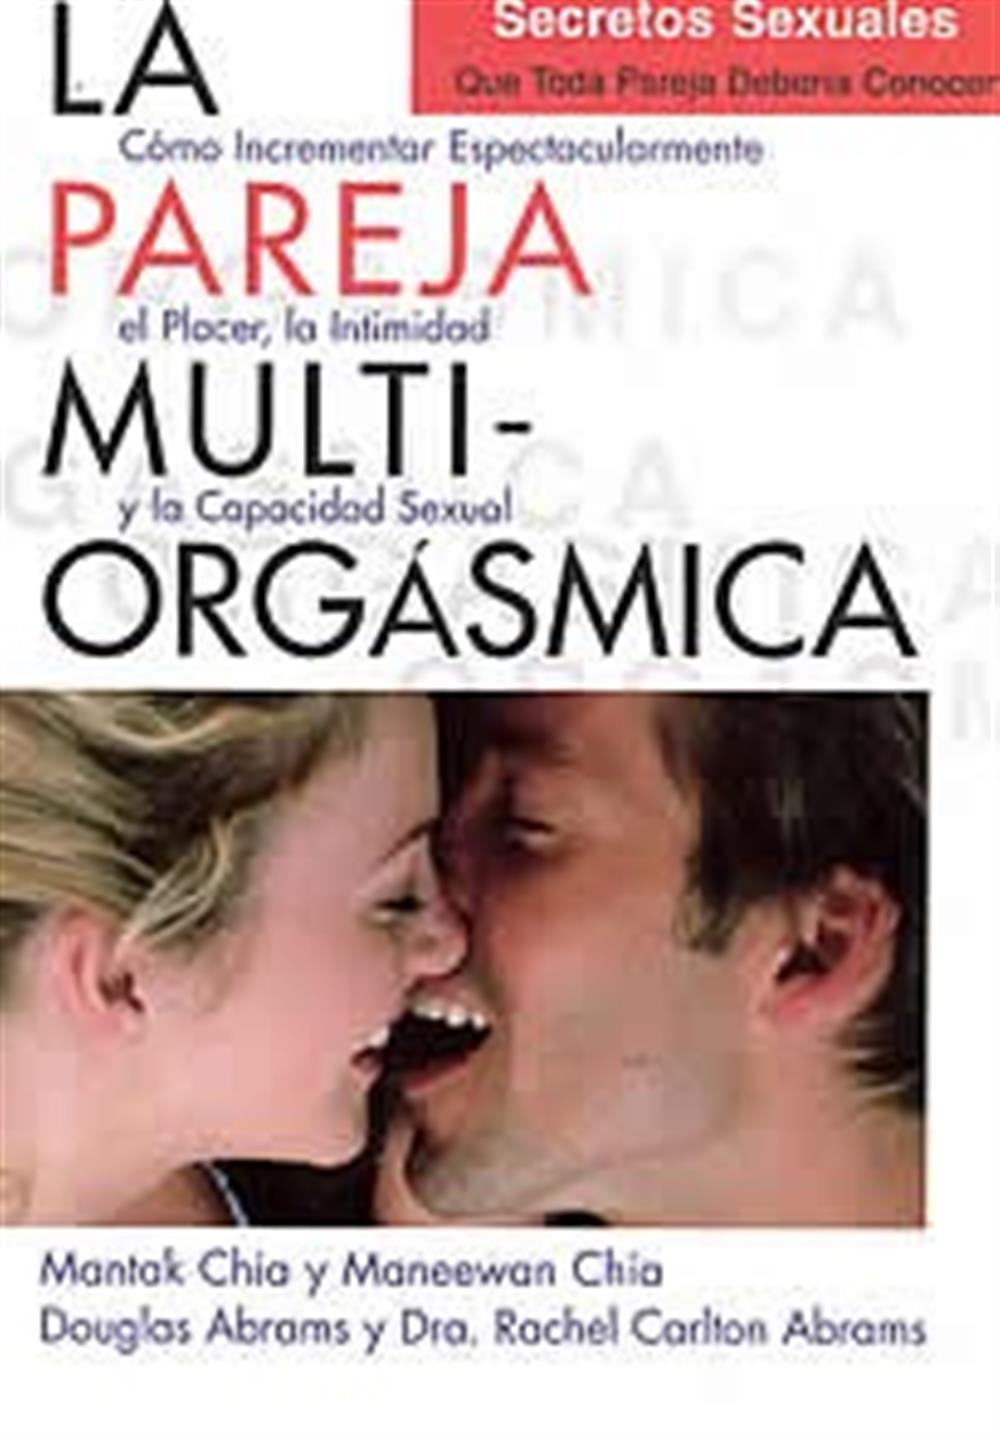 La pareja multi-orgásmica